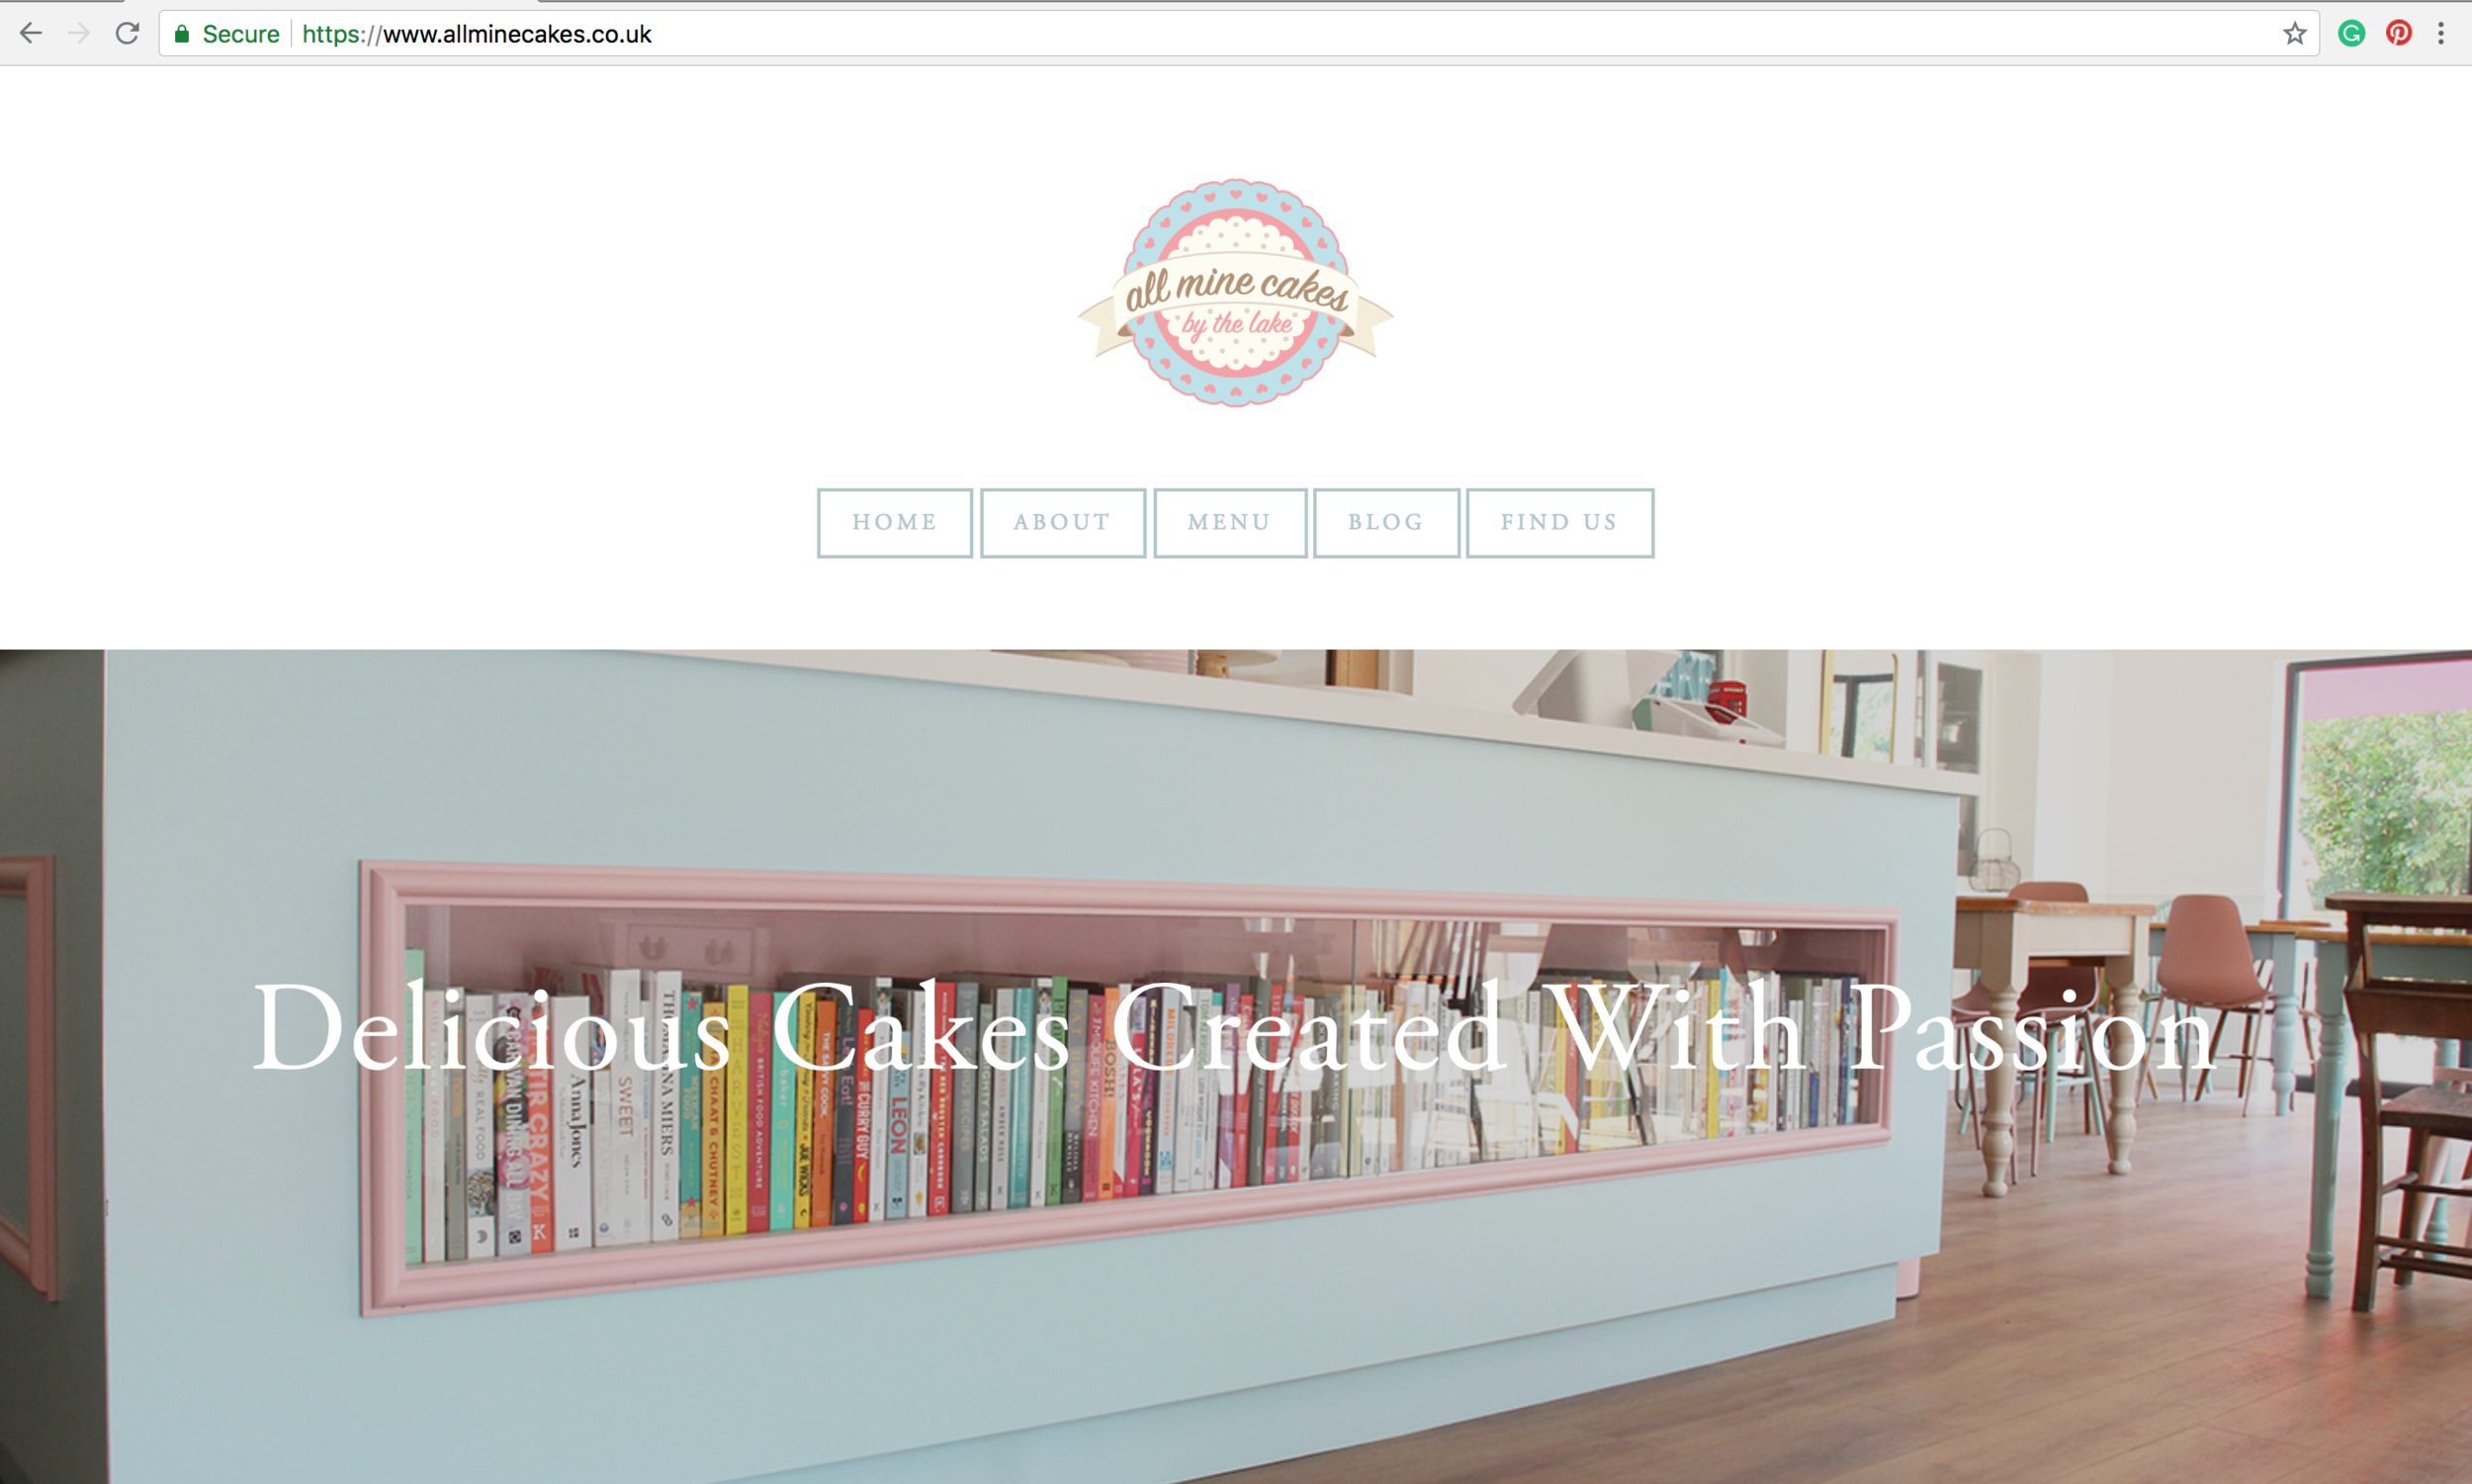 cafe website Southwell